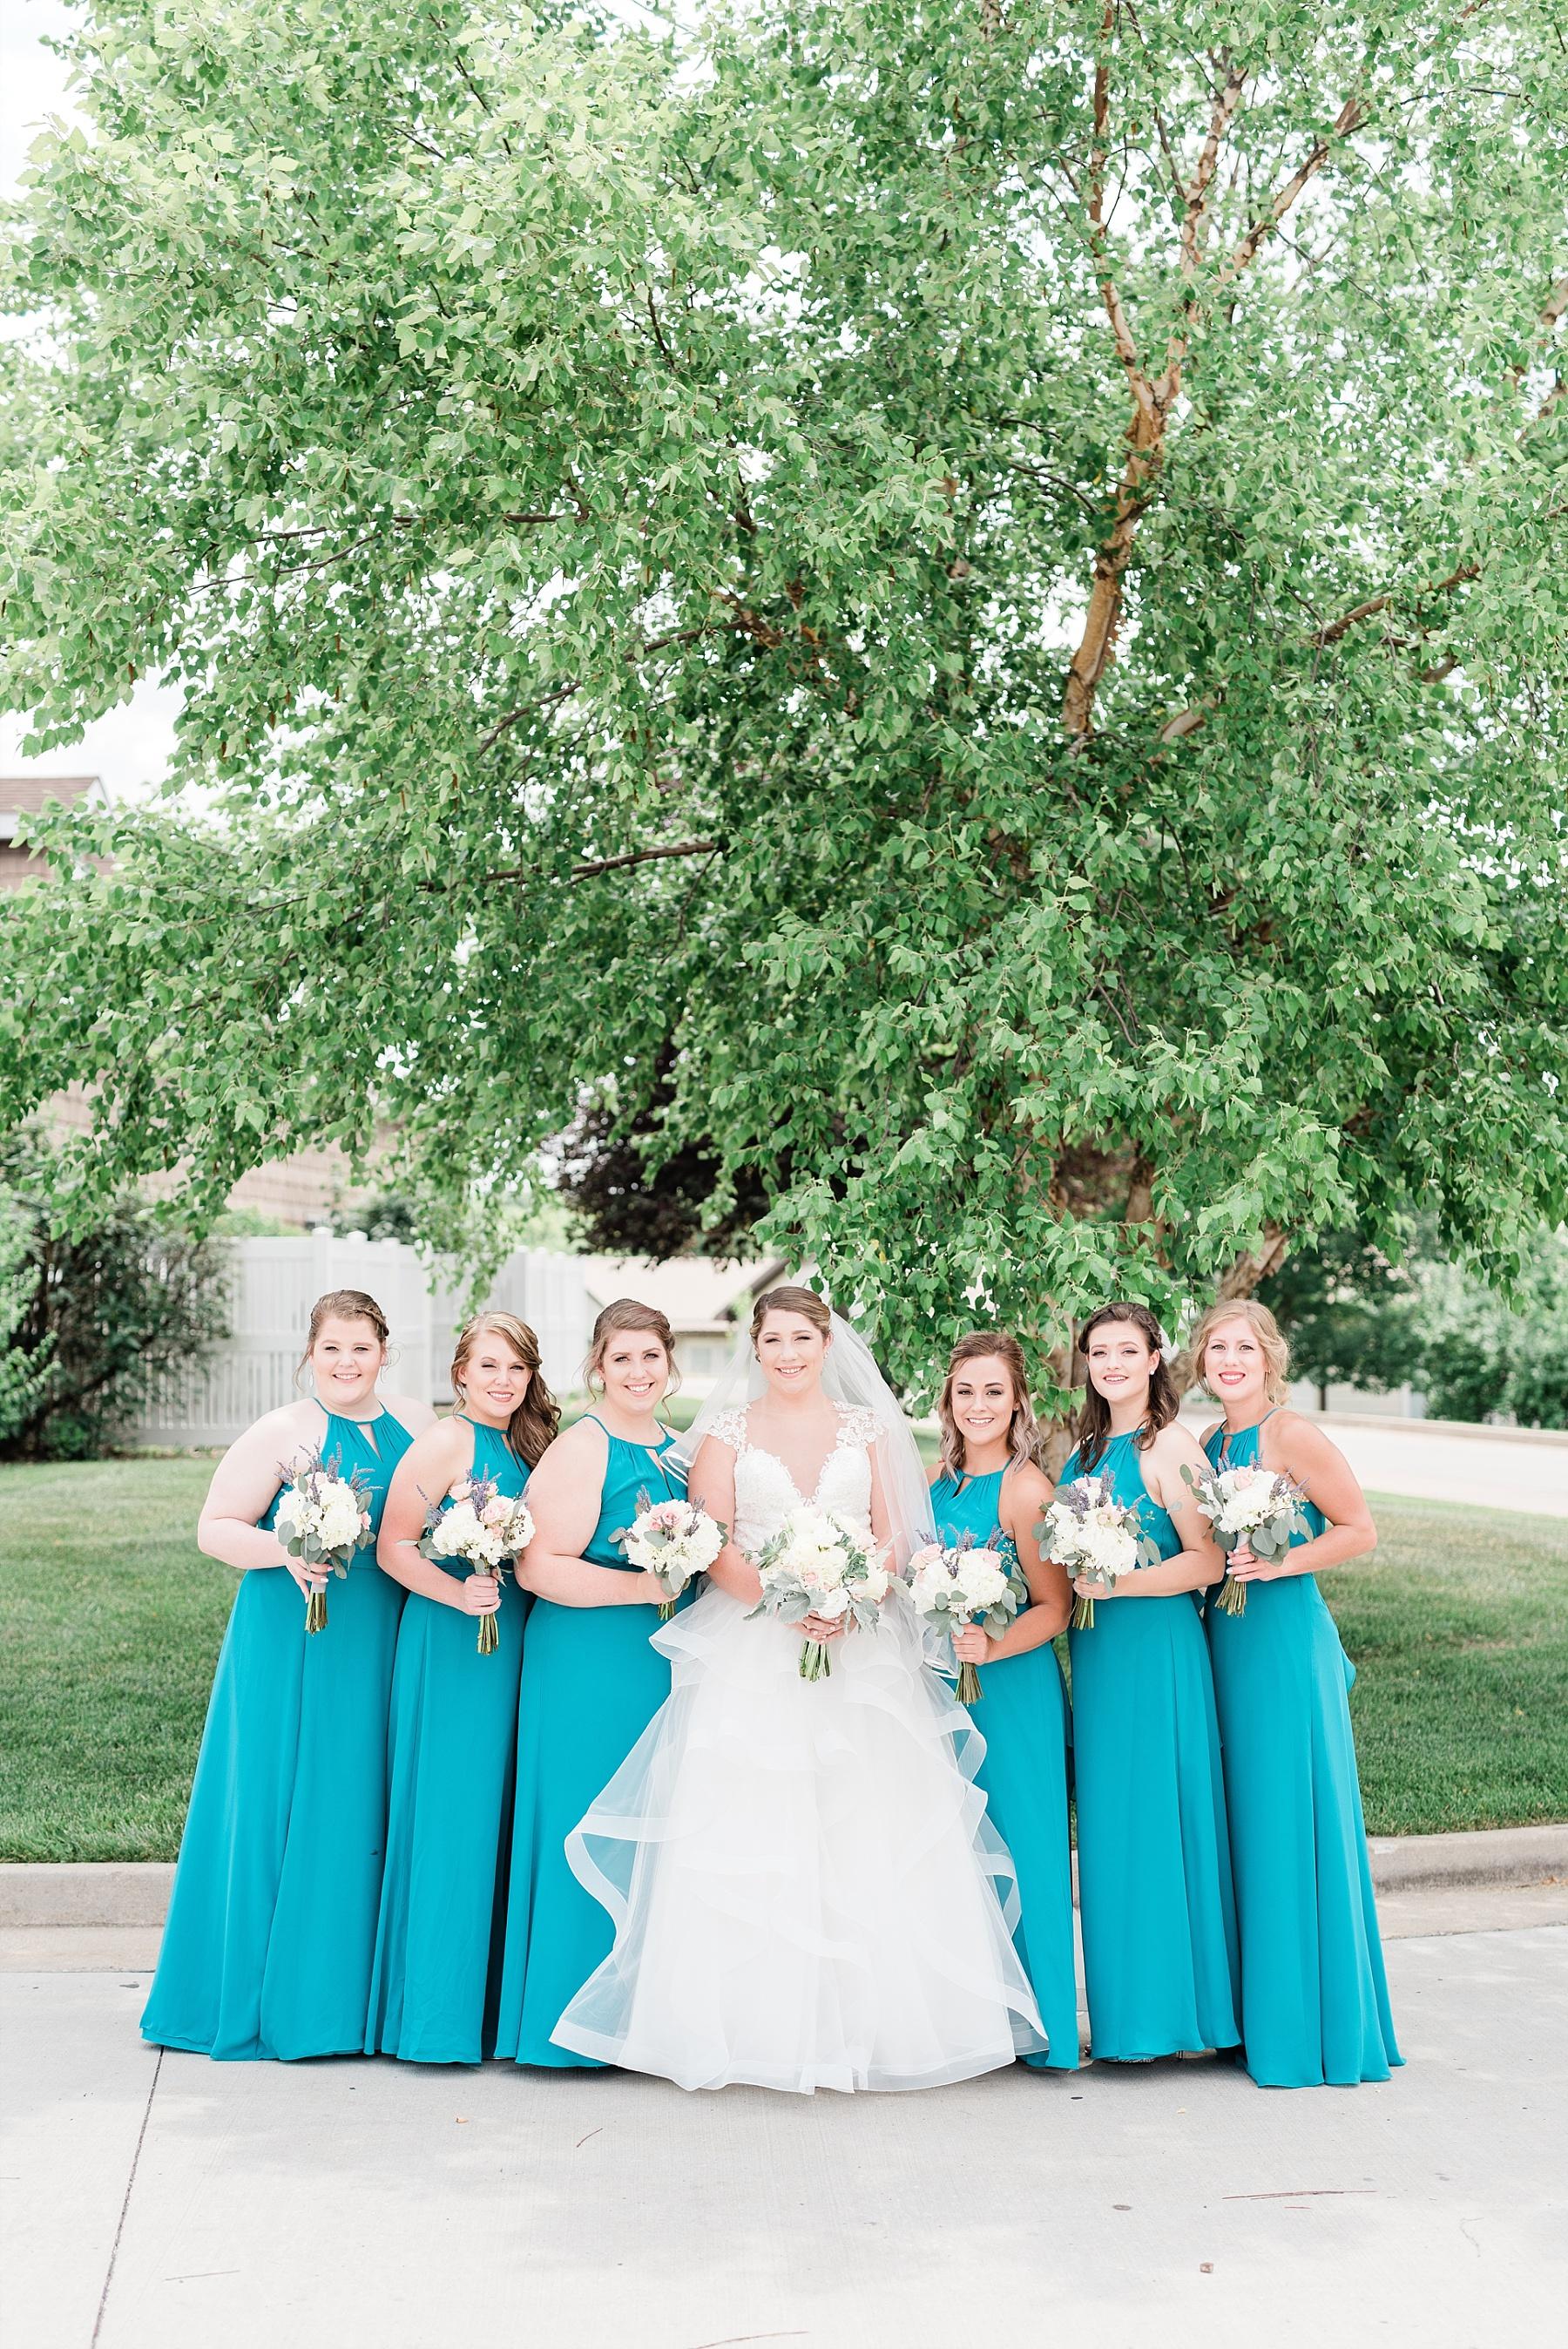 Baurichter Wedding at Stoney Creek Inn Columbia Missouri by Kelsi Kliethermes Photography_0004.jpg